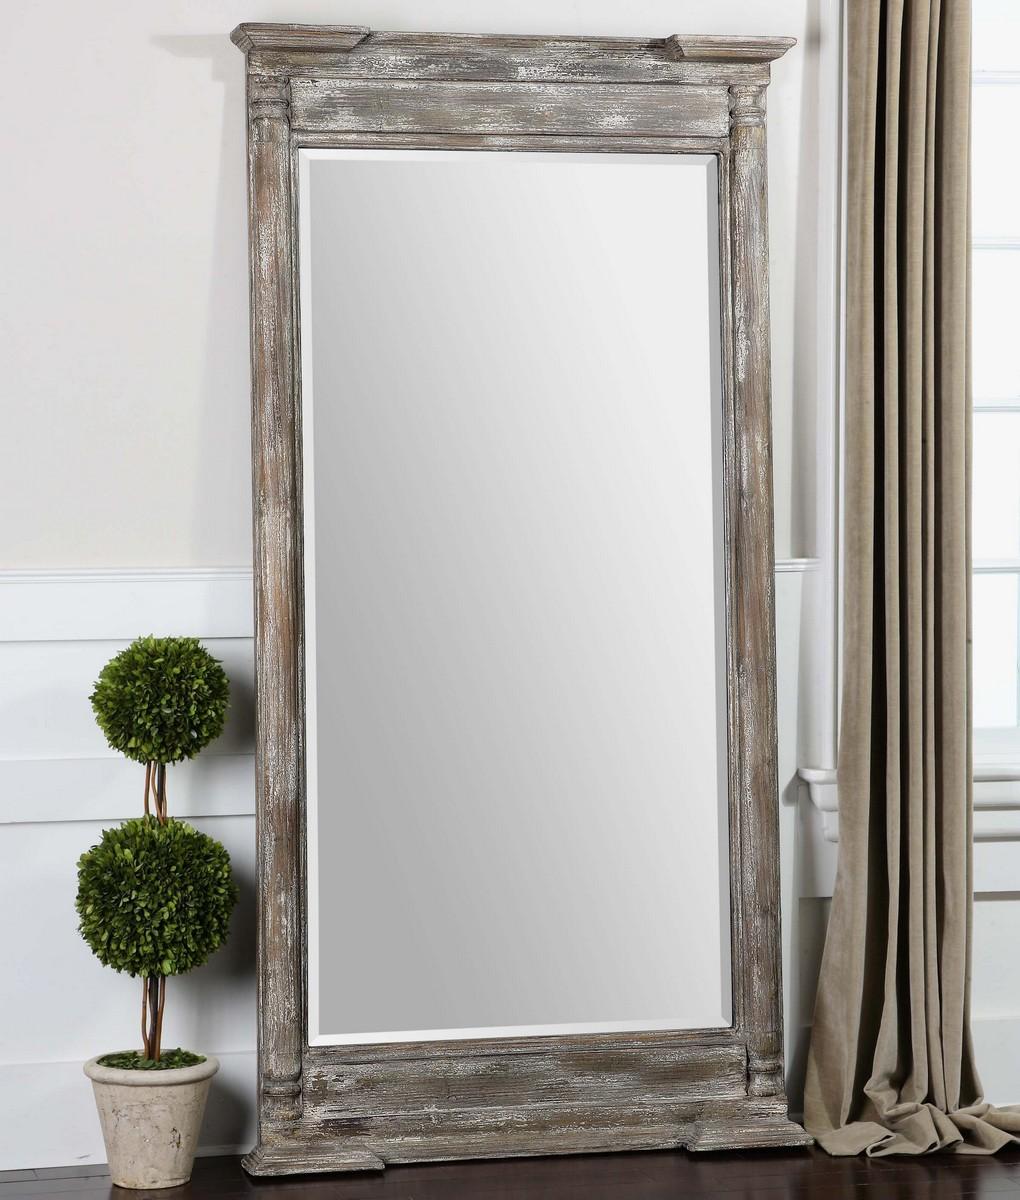 Uttermost Valcellina Wooden Leaner Mirror